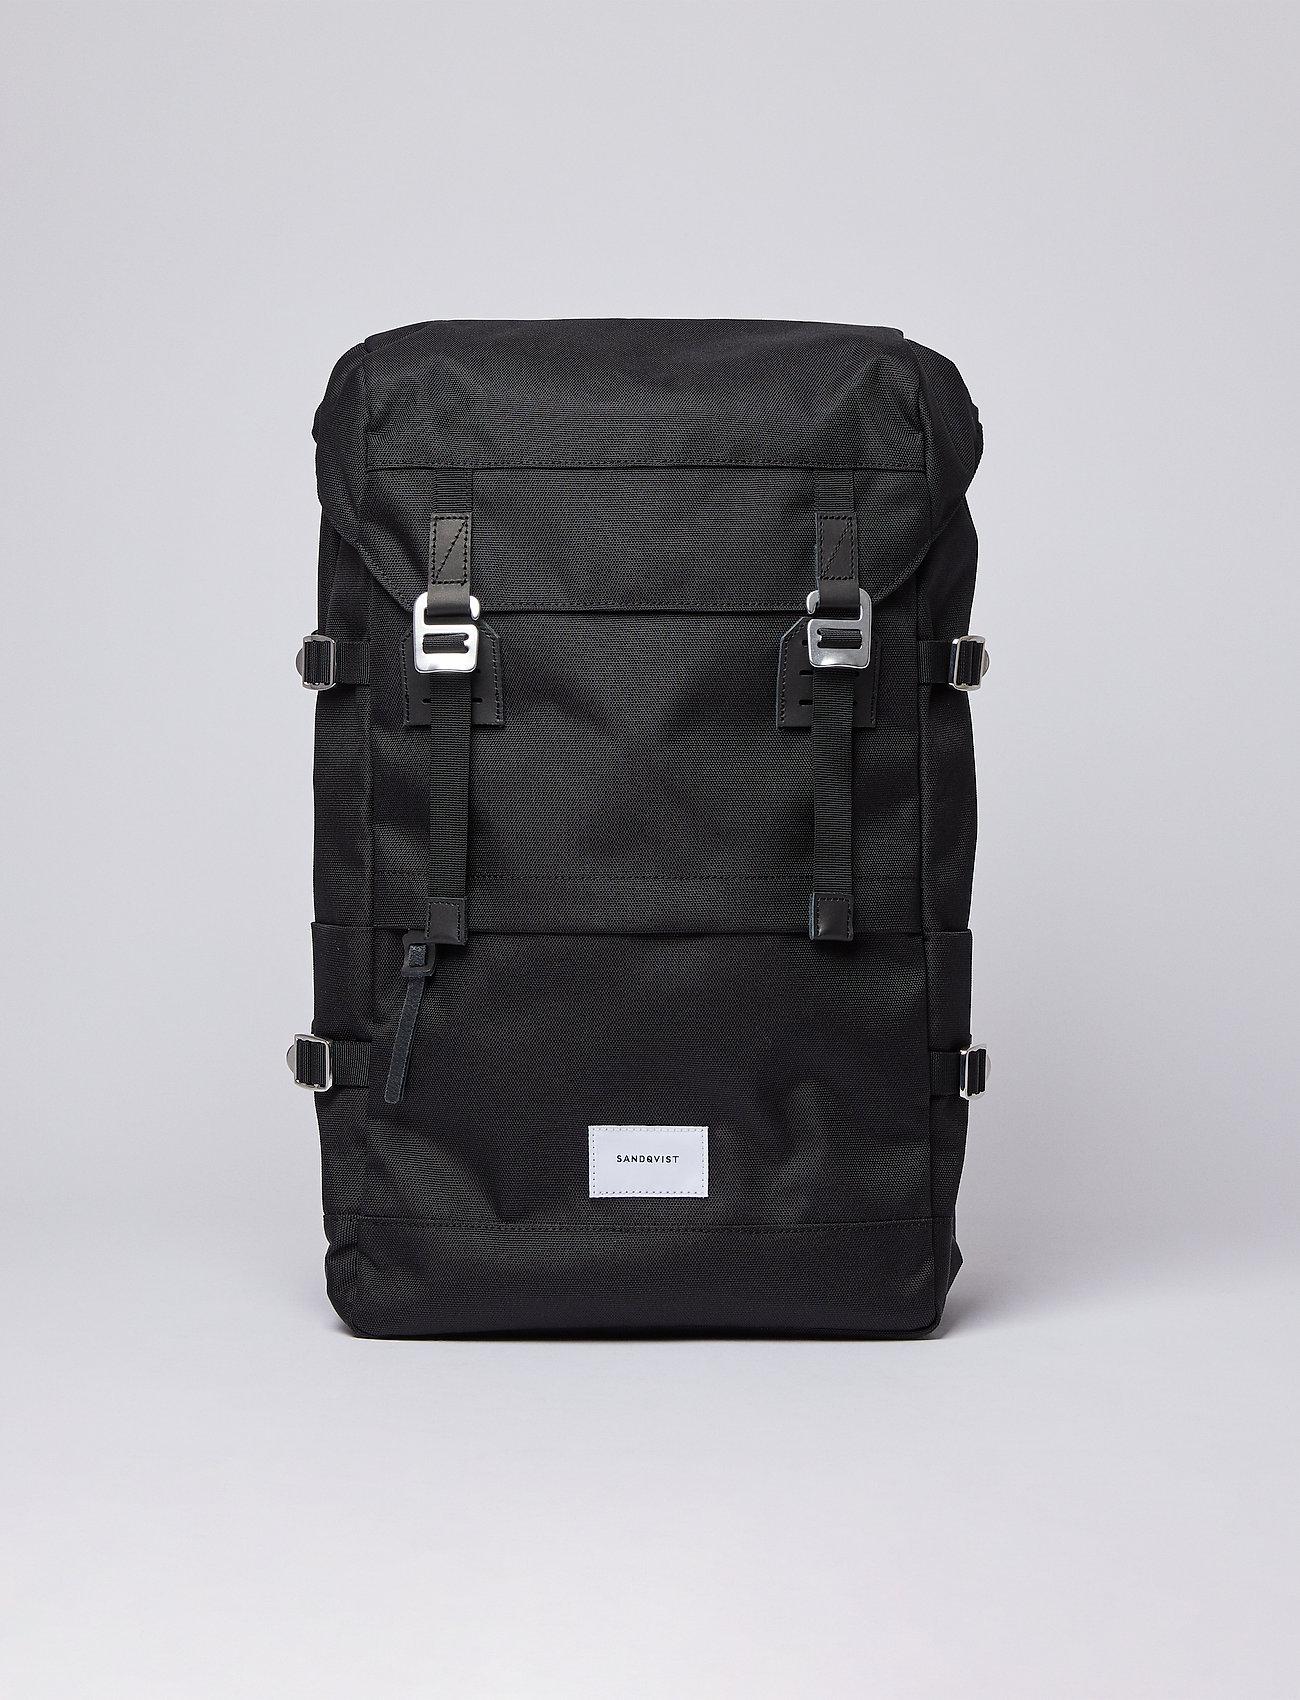 SANDQVIST - HARALD - nieuwe mode - black - 0